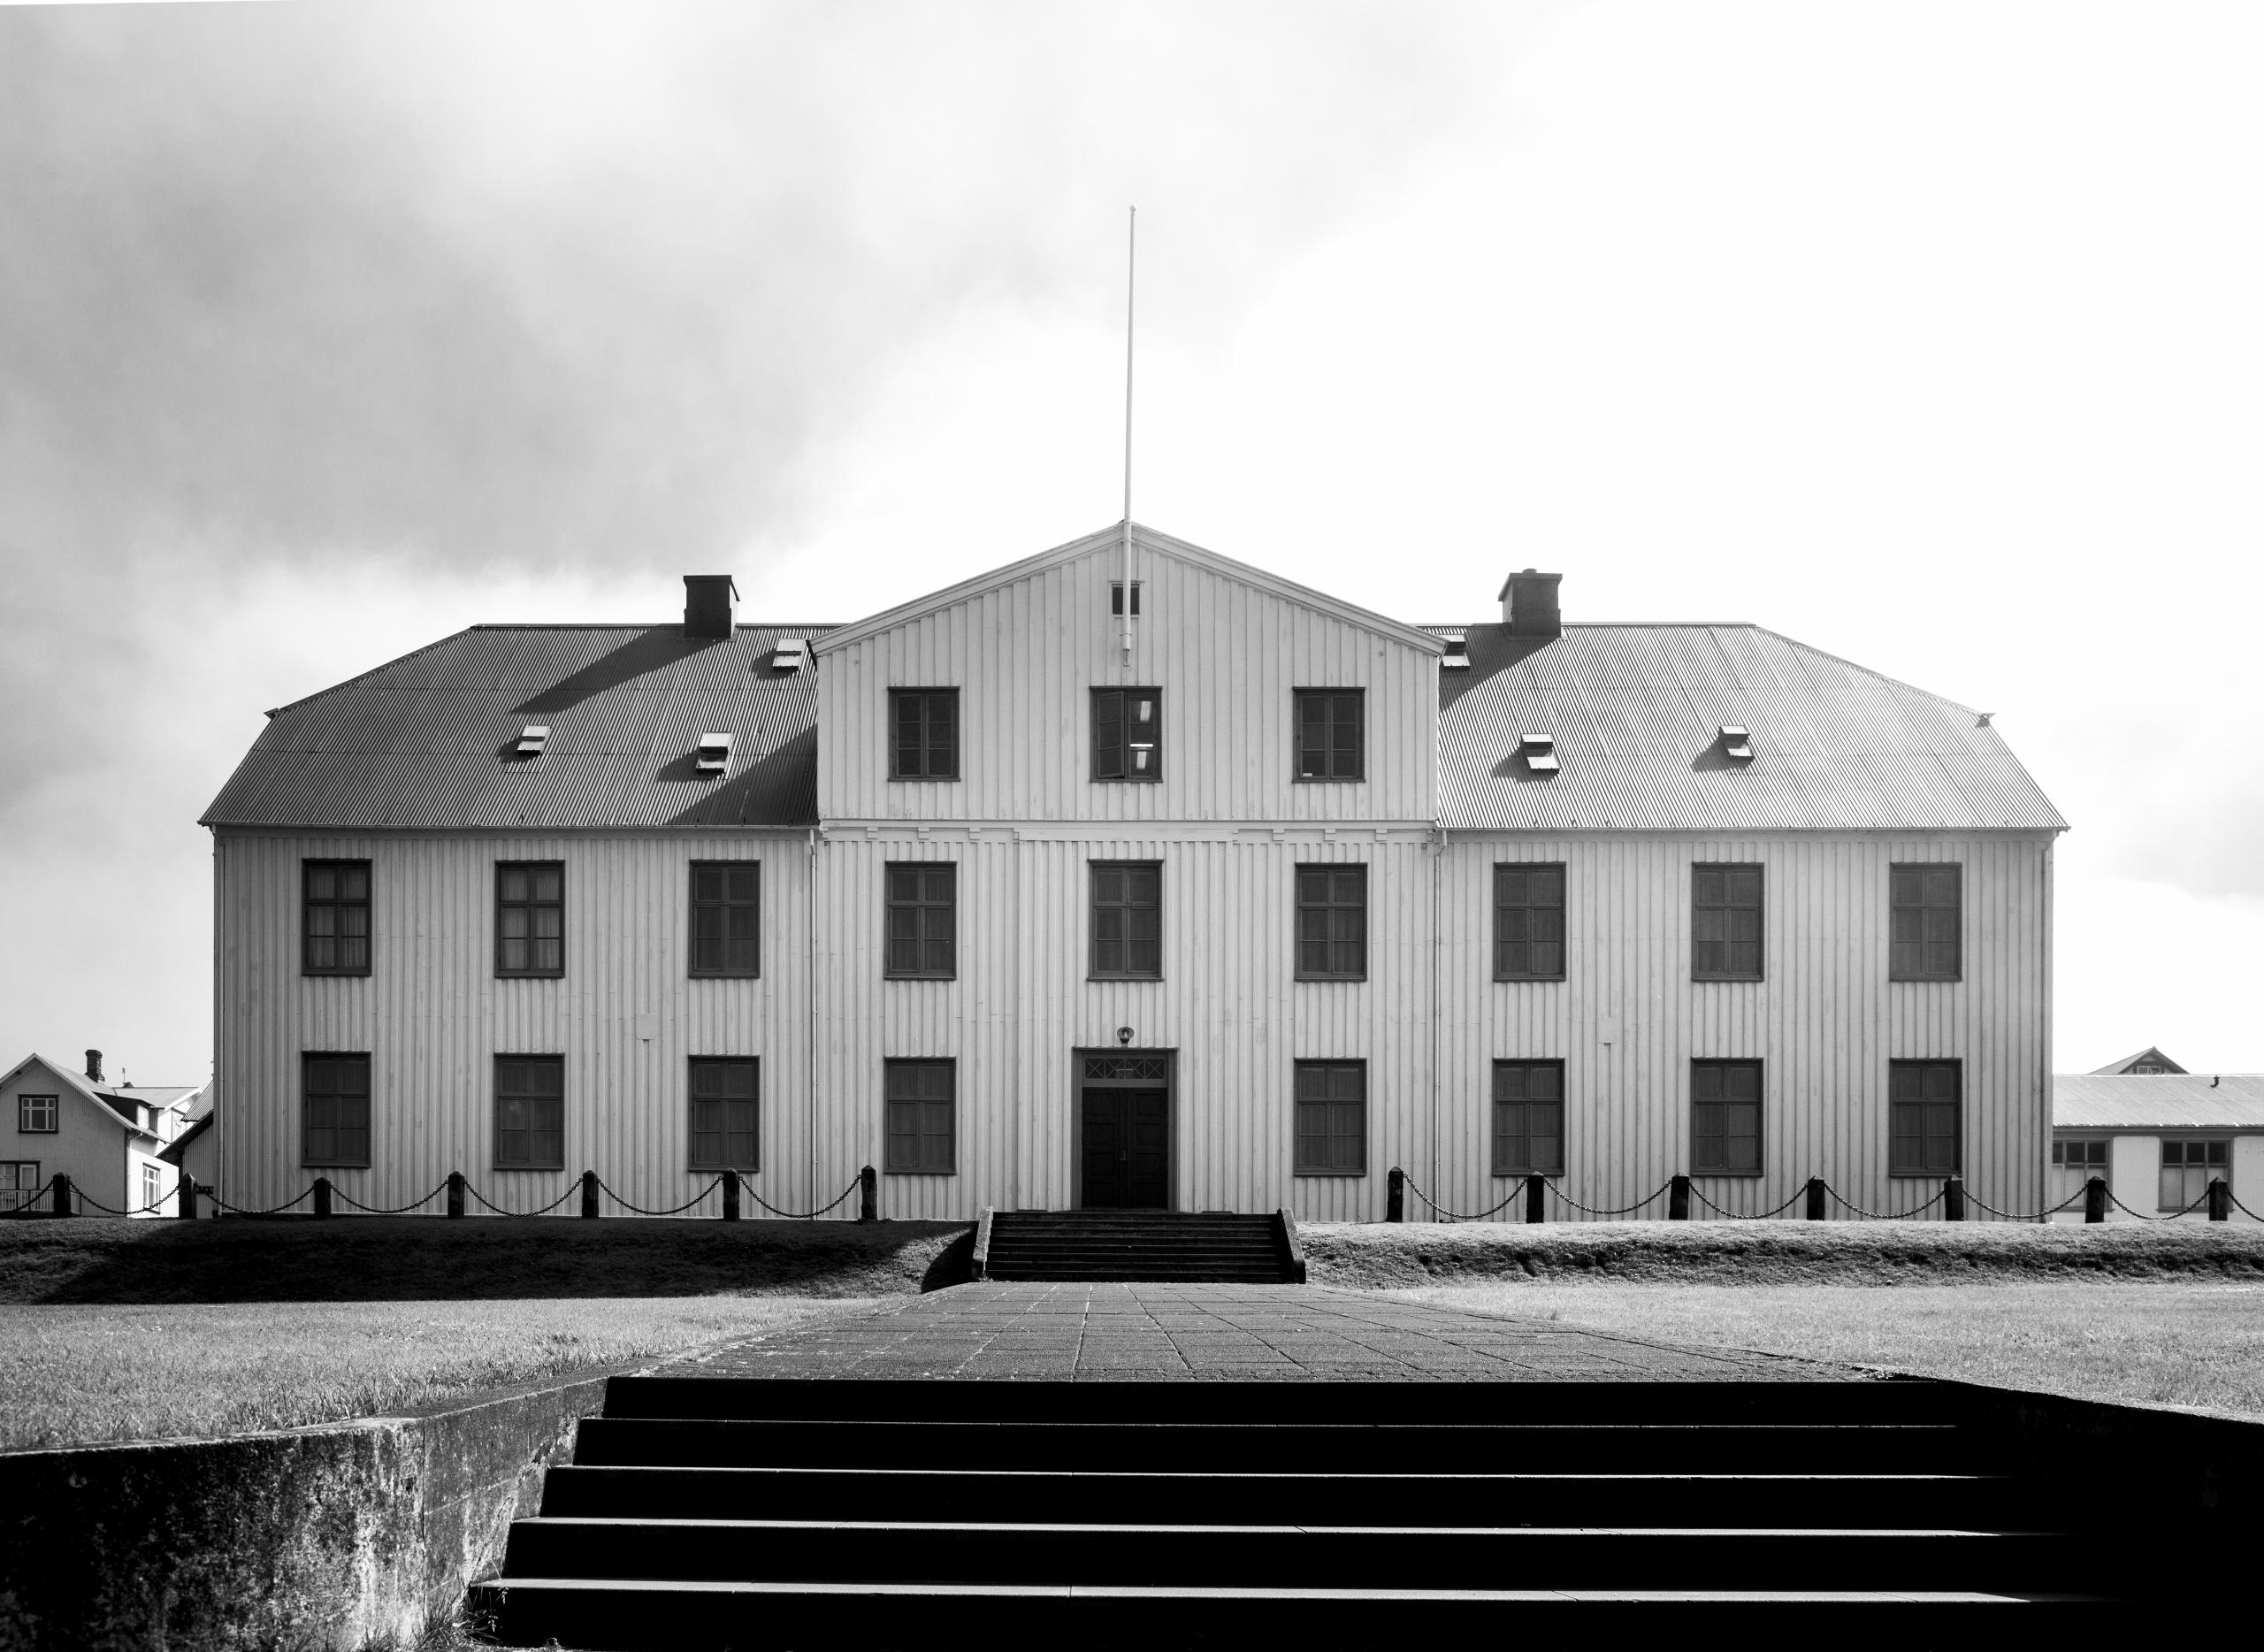 Reykjavik - High School https - canon - junwin   ello